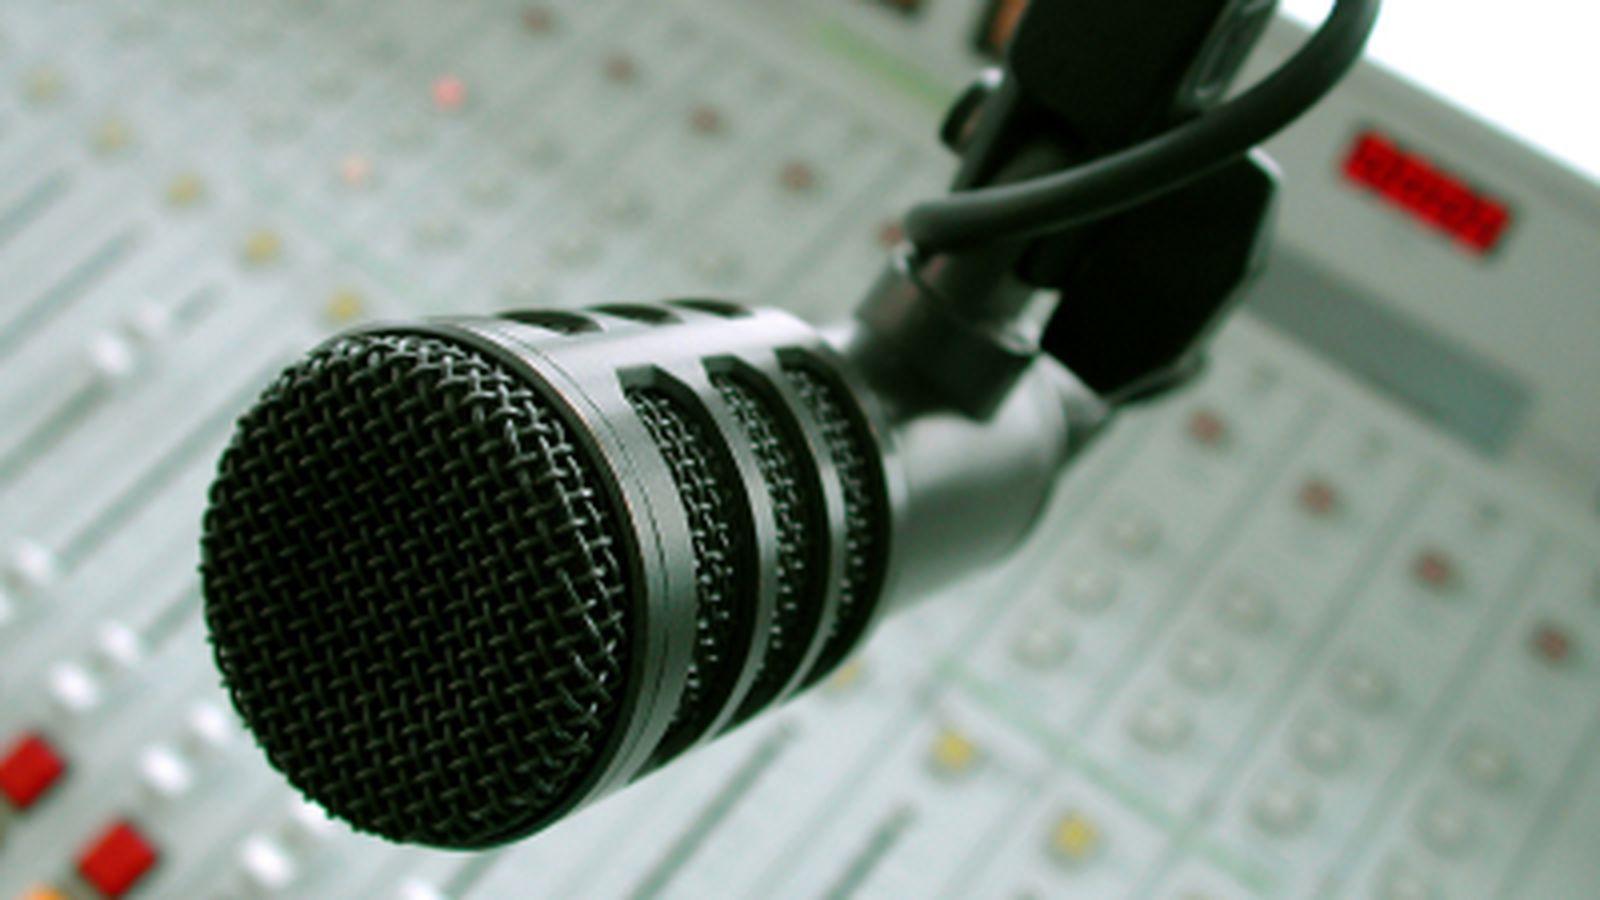 Microphone.0.0